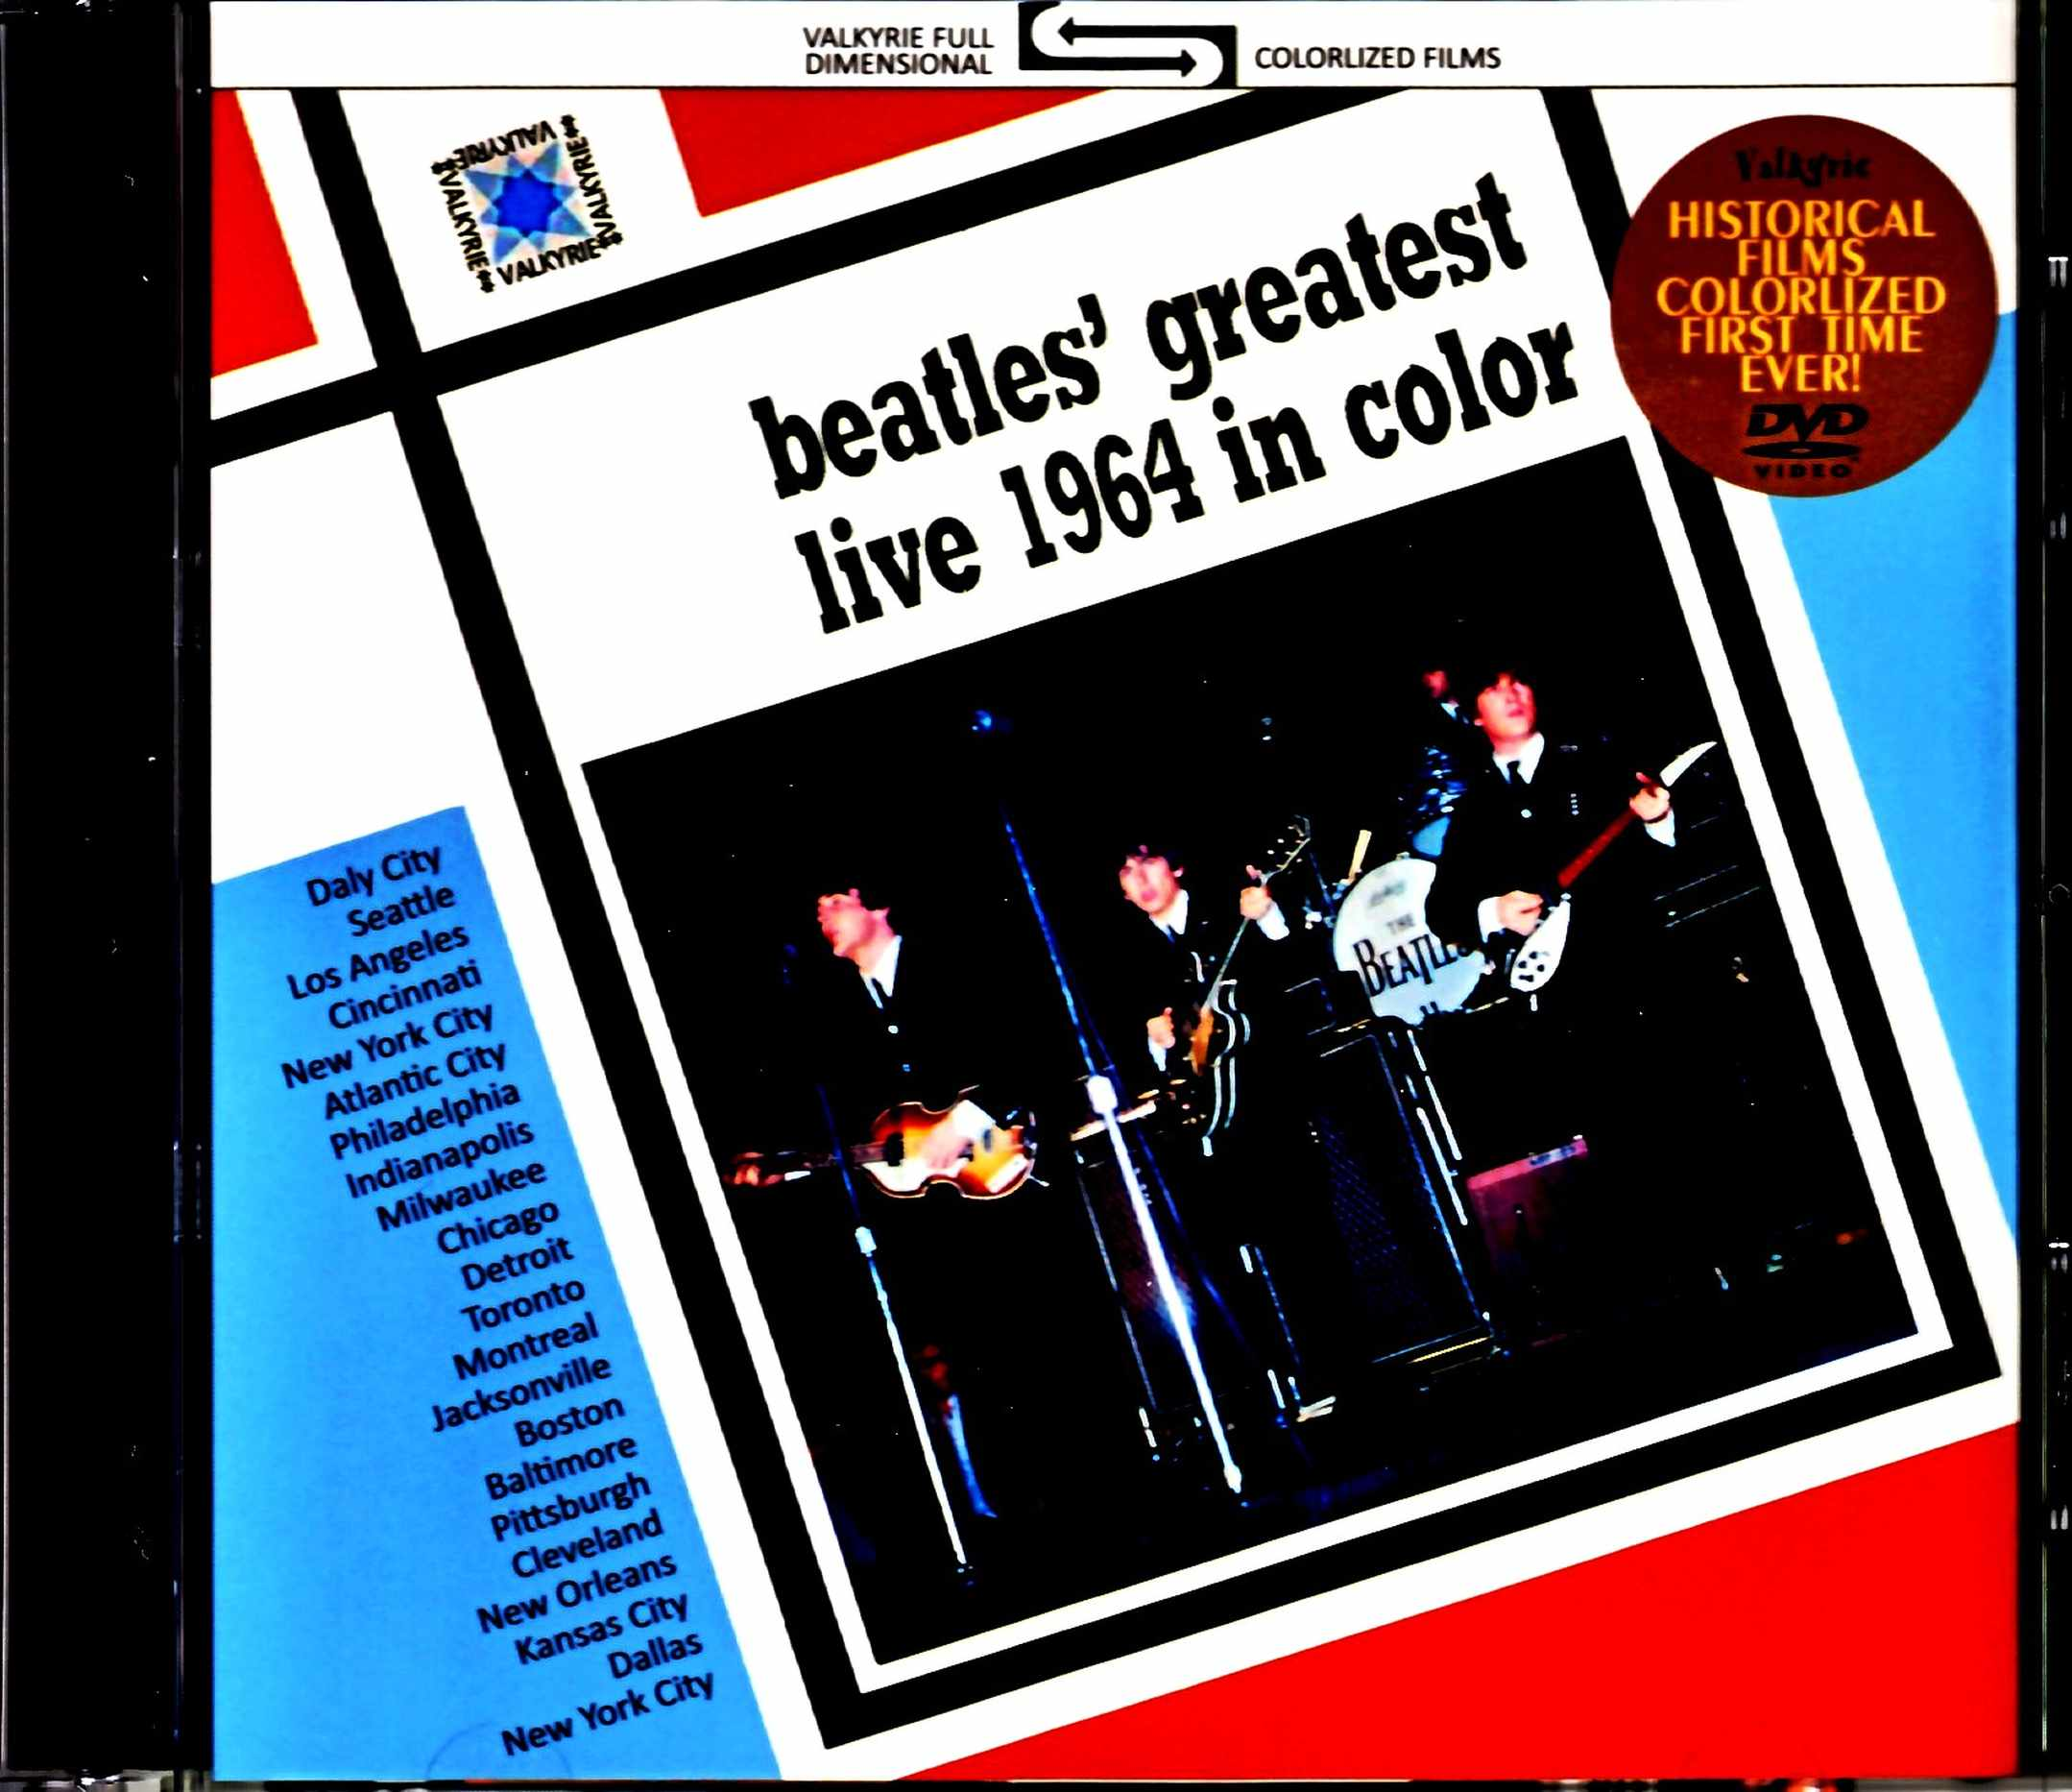 Beatles ビートルズ/北米ツアー ライヴ & ドキュメンタリー・フィルム 1964年 カラー版 North American Tour 1964 in Color